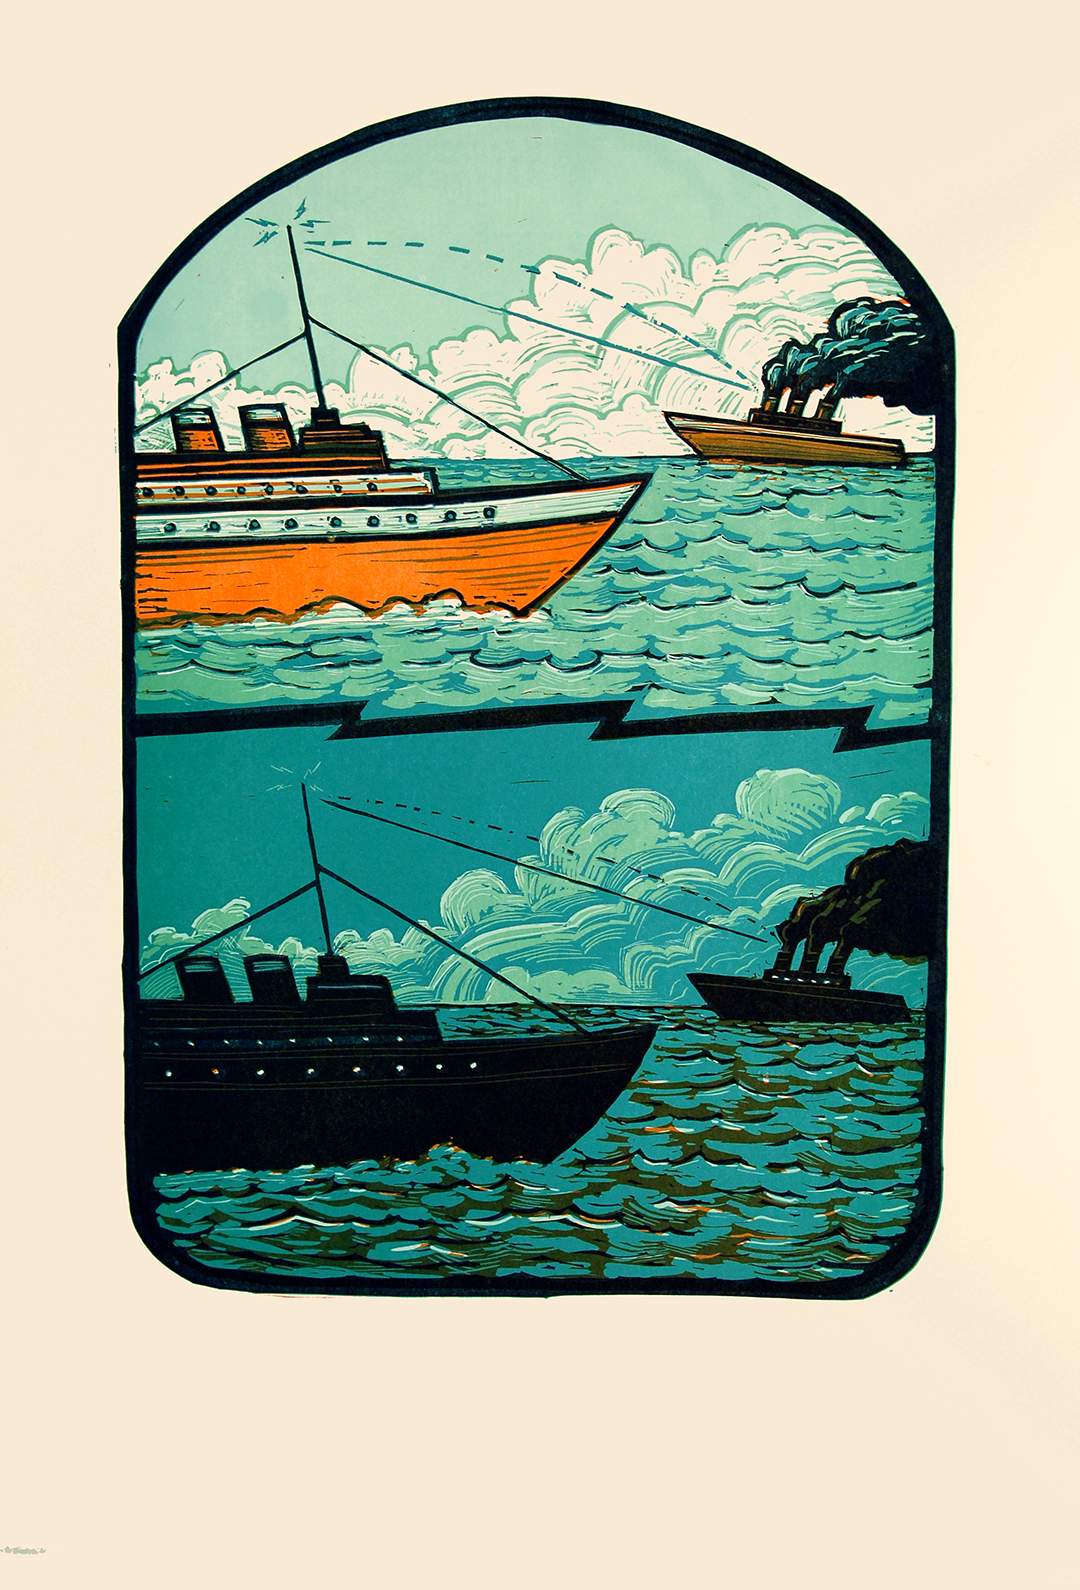 rascal-flatts-ships.jpg